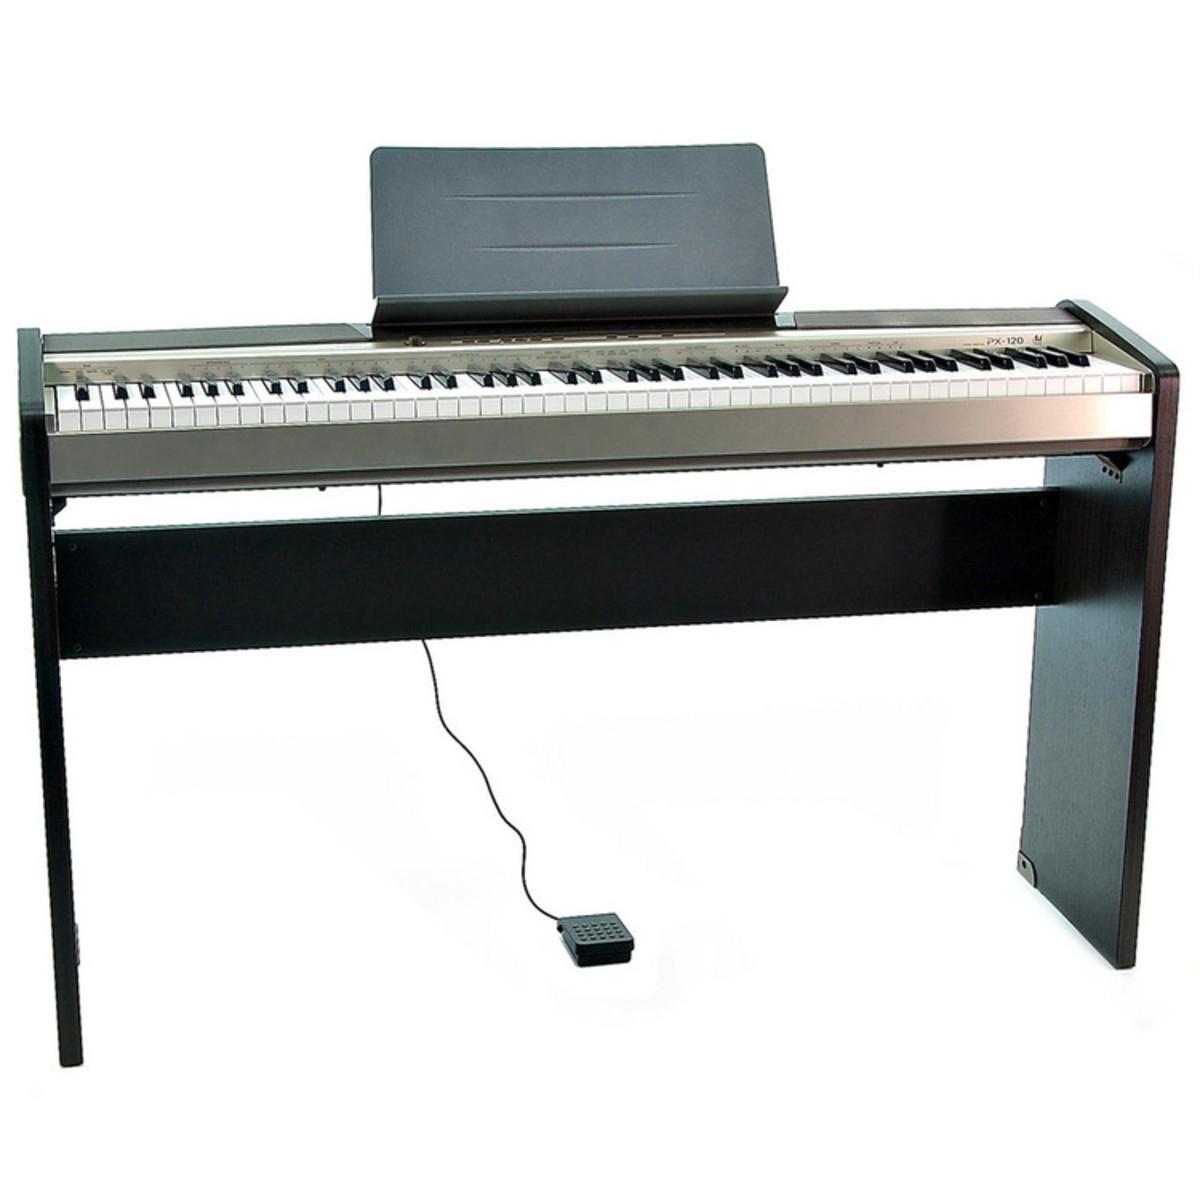 Digital Piano Free : discontinued casio privia px 120 digital piano free stand at ~ Vivirlamusica.com Haus und Dekorationen